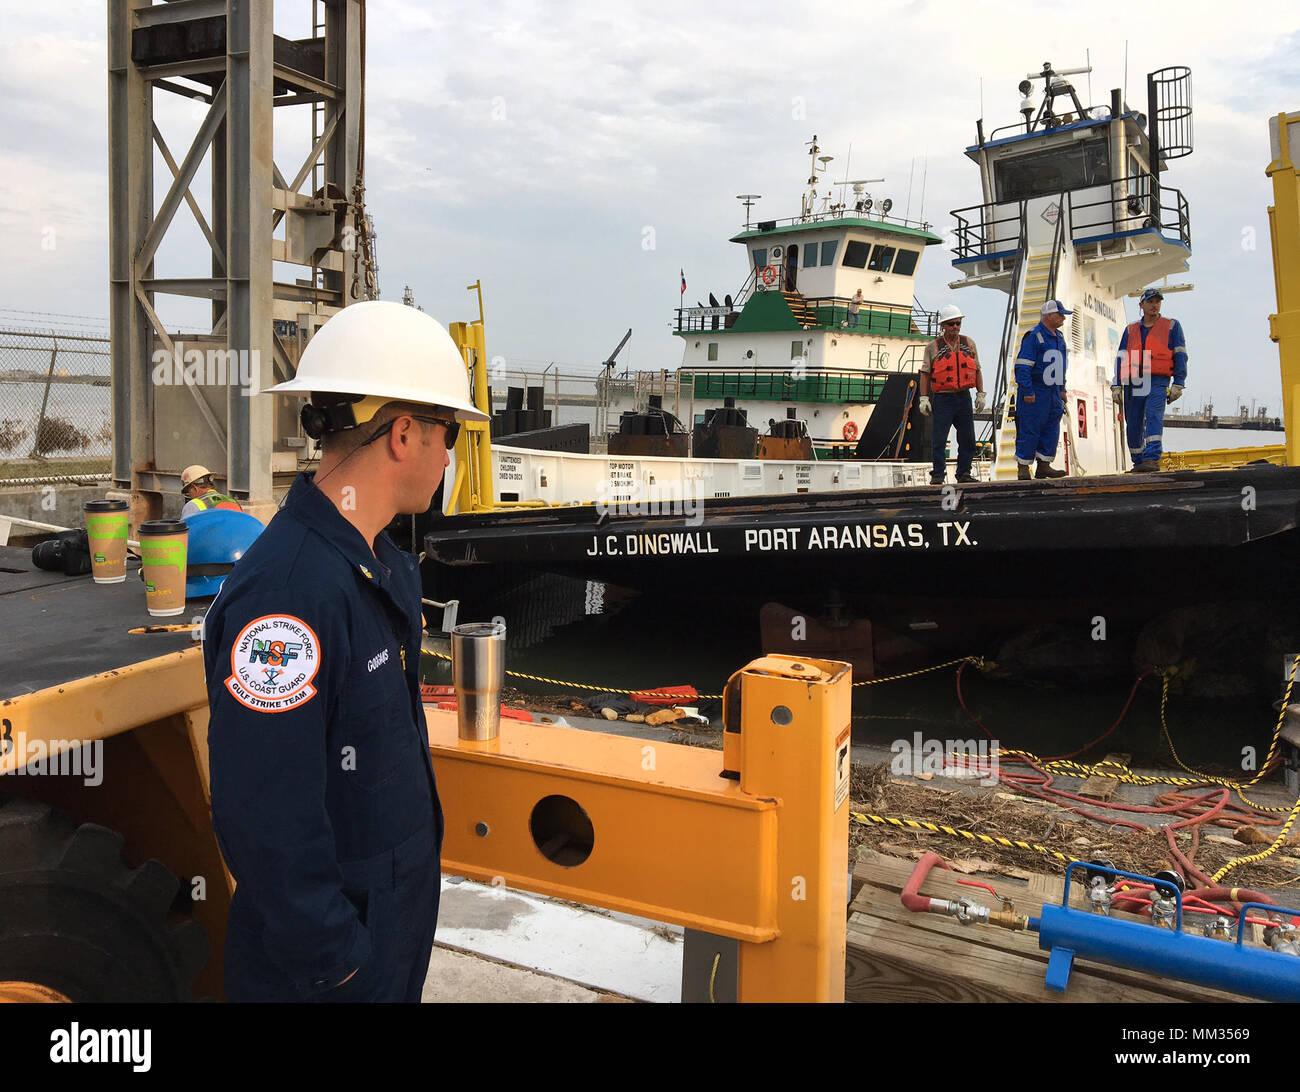 Aransas Pass ferries are recovered, Sept. 3, 2017, near Port Aransas, Texas, following Hurricane Harvey. U.S. Coast Guard photo. - Stock Image